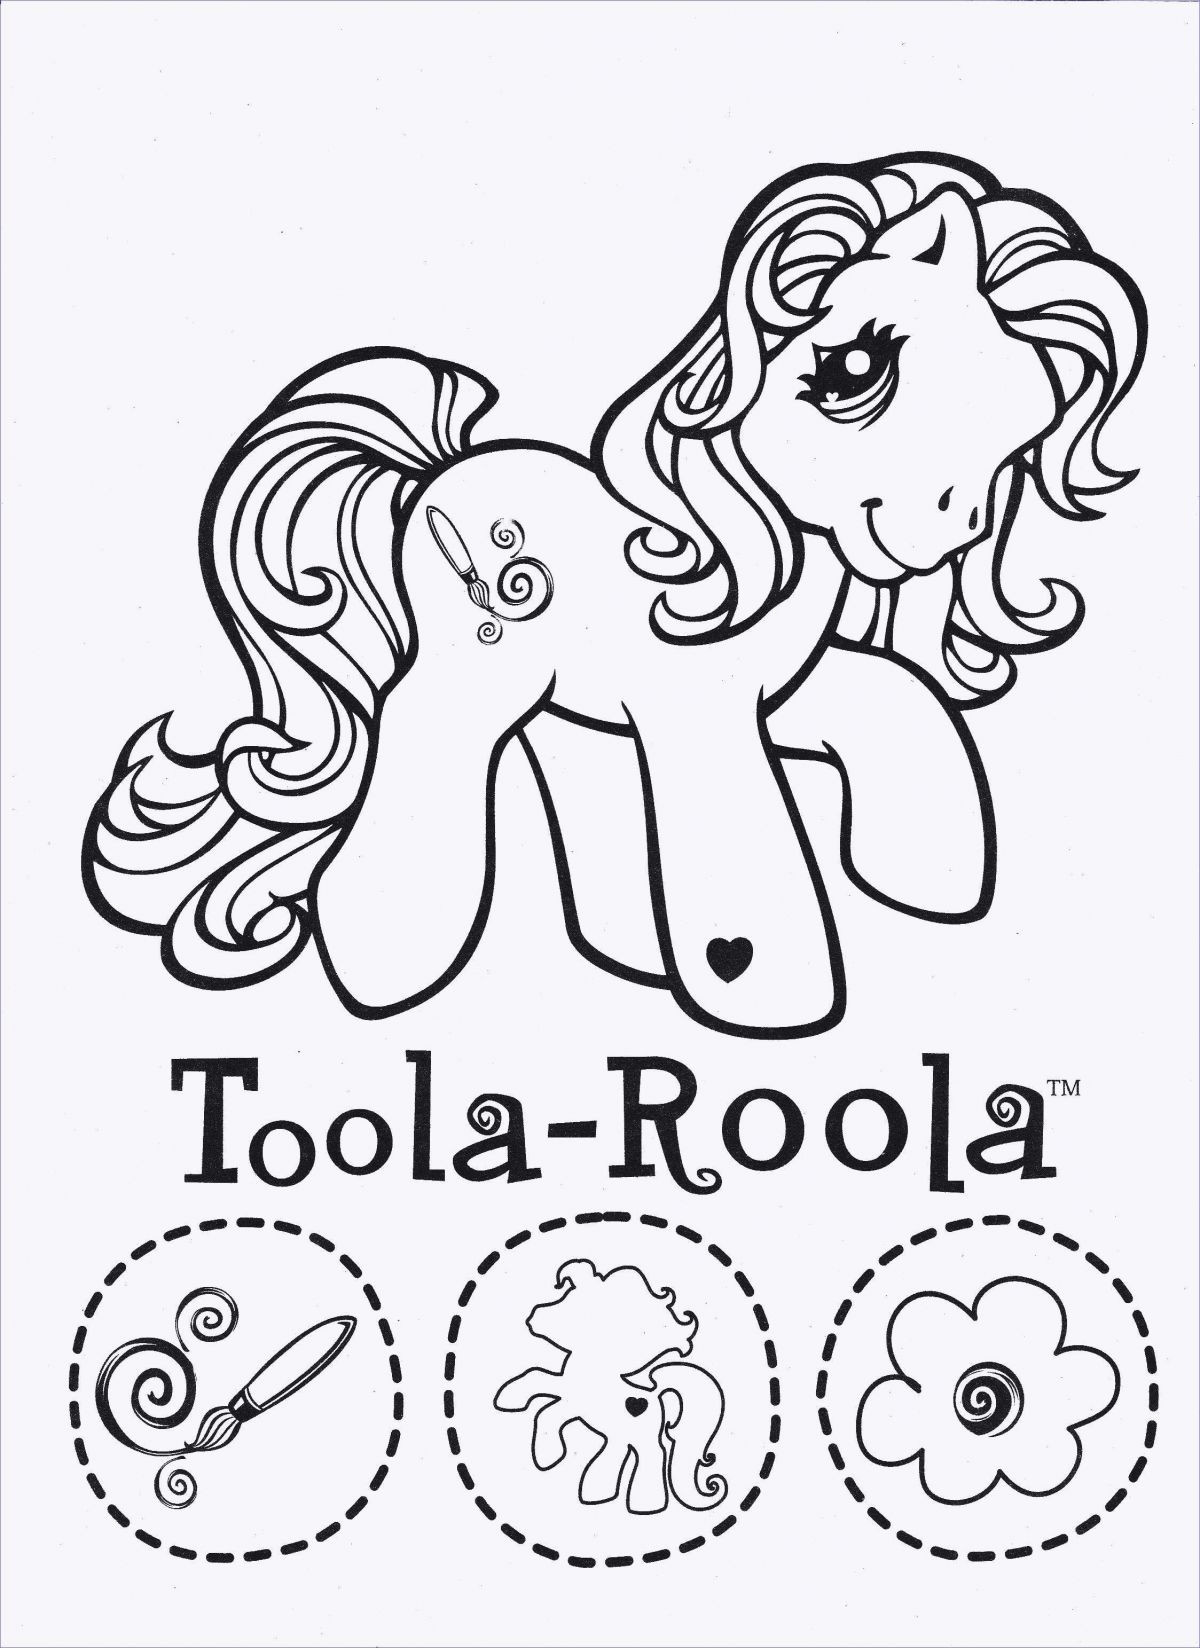 My Little Pony Ausmalbilder Kostenlos Neu My Little Pony Ausmalbilder Luna Fresh Ausmalbilder My Little Pony Bild